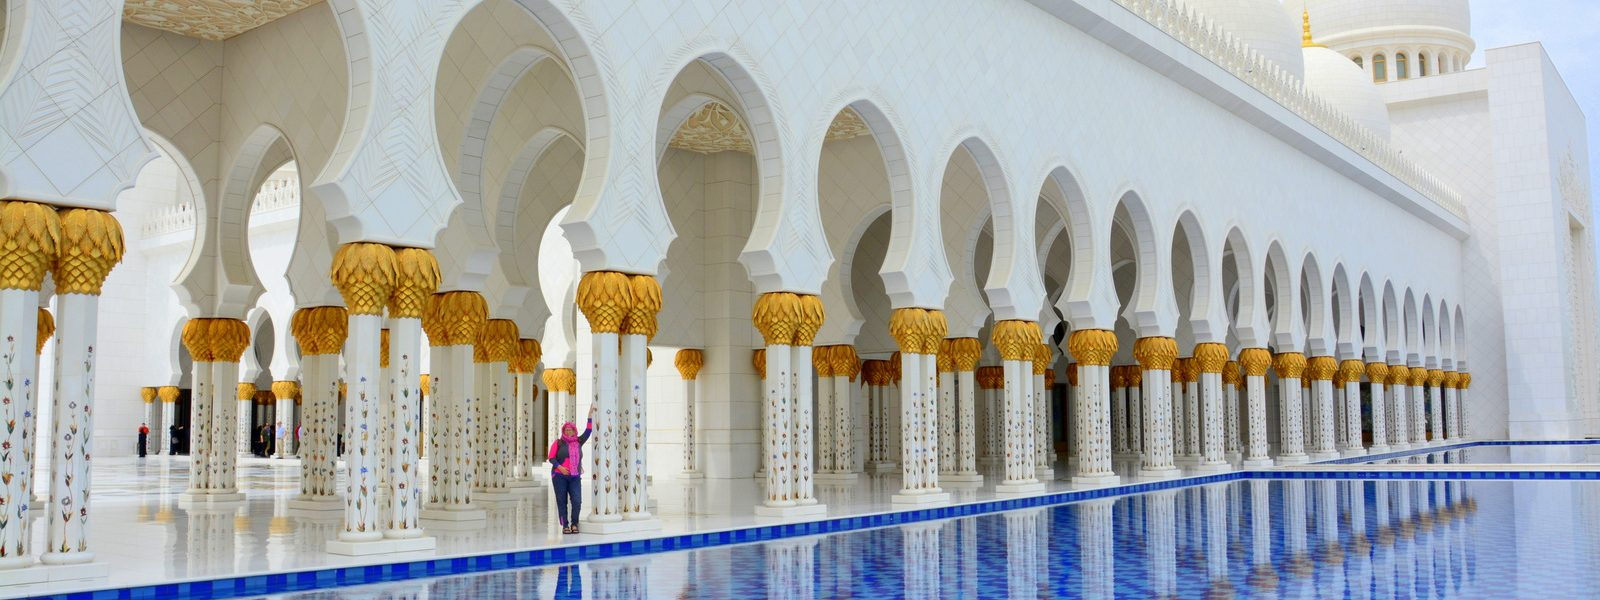 Abu Dhabi and Sheik Zayed Grand Mosque